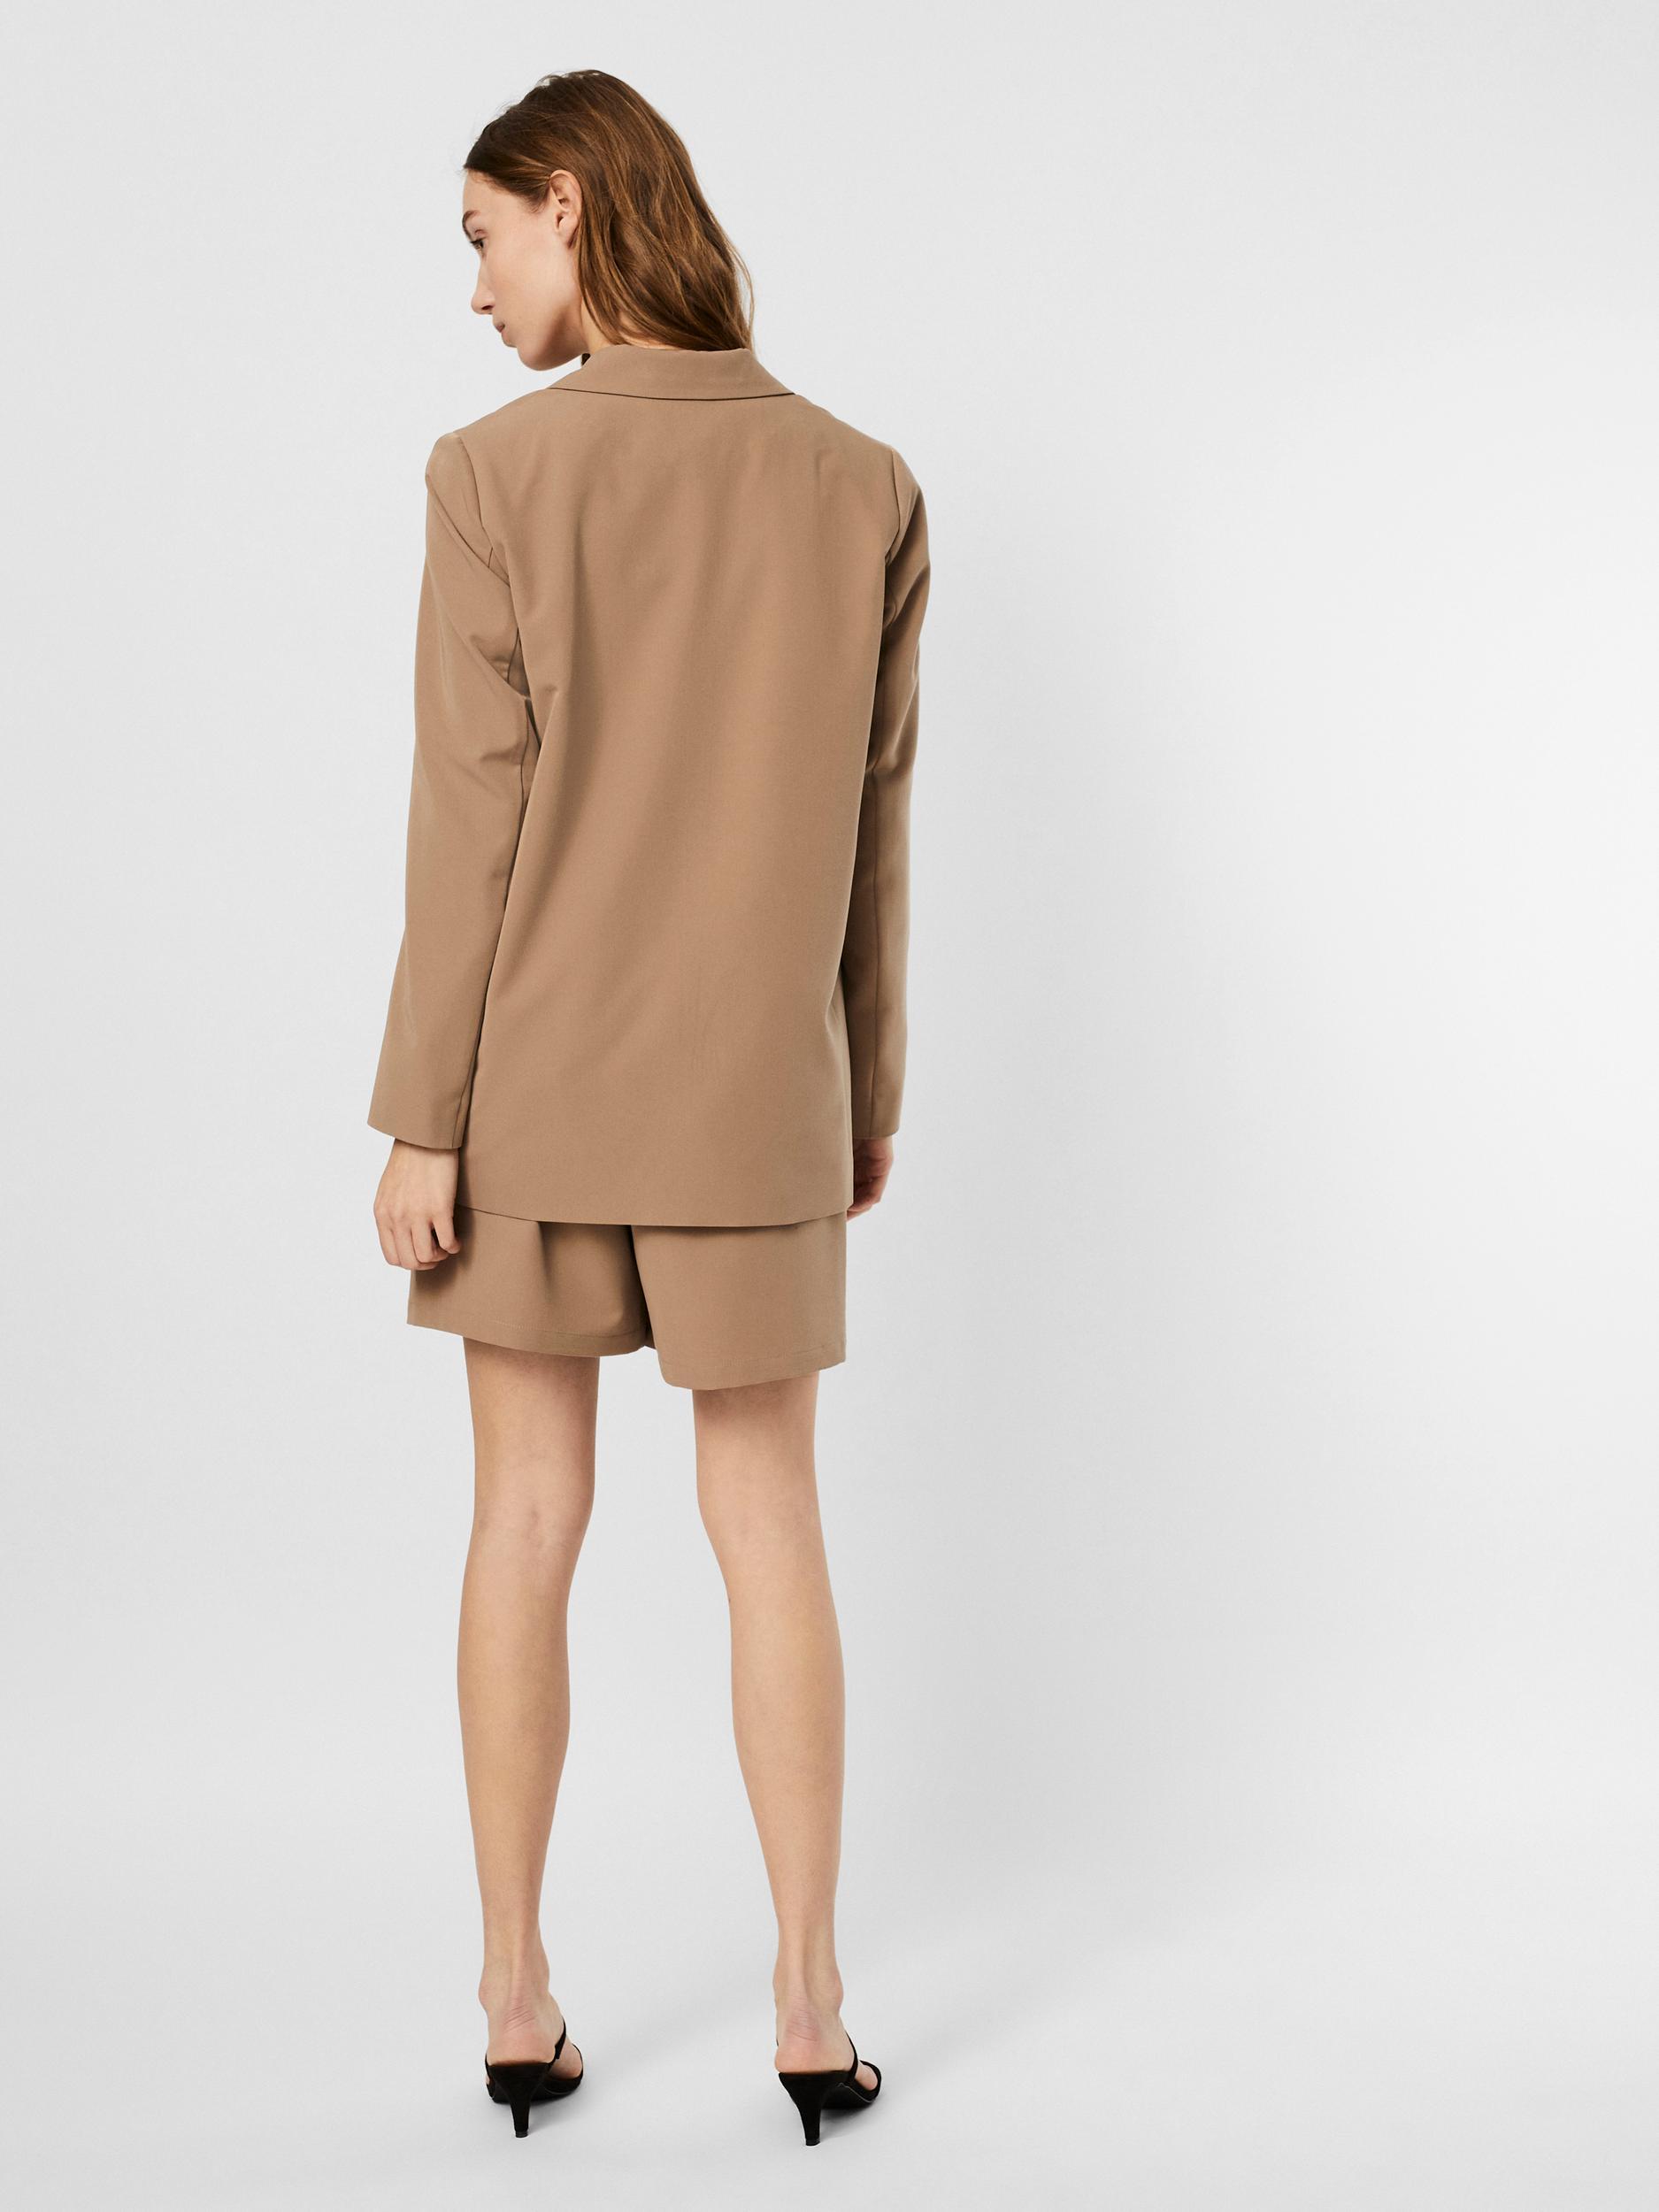 Vero Moda Zelda blazer, taupe gray, 40